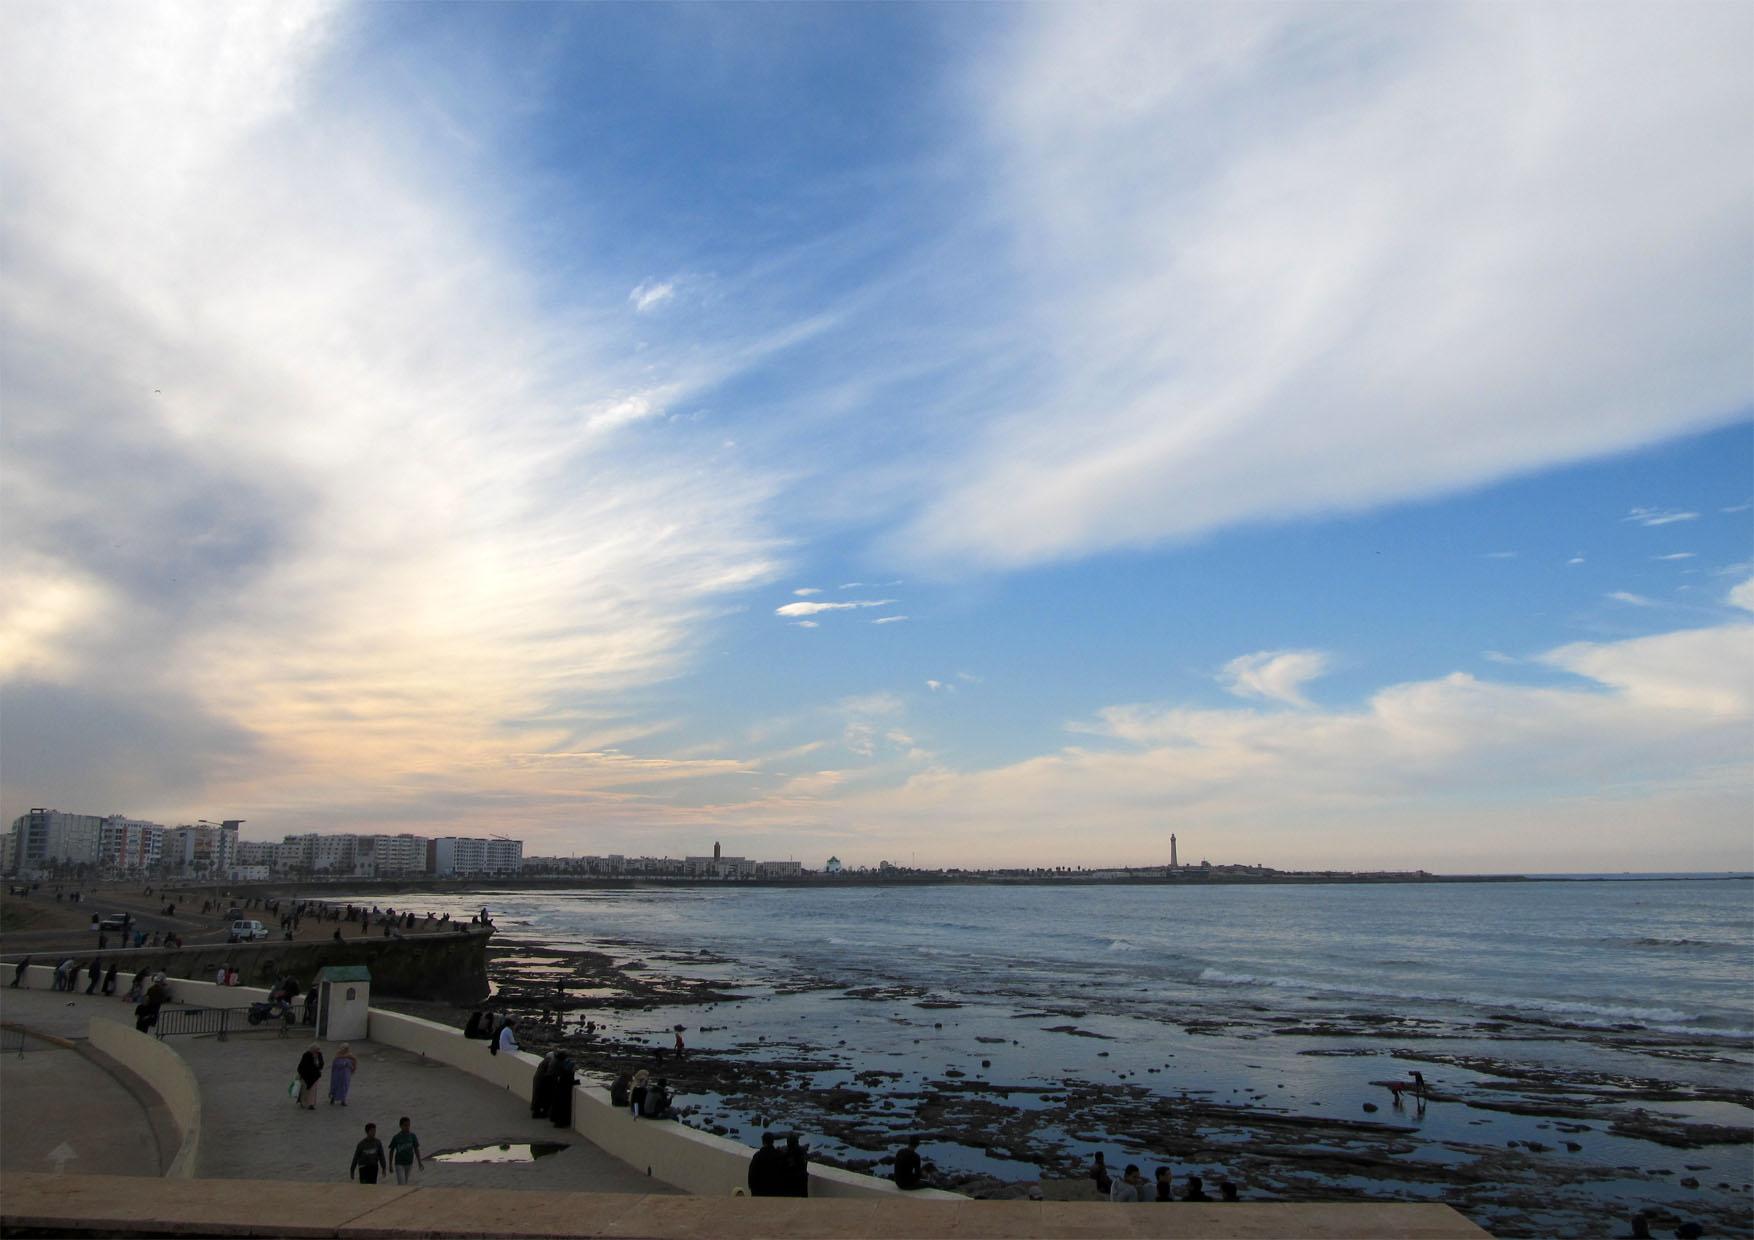 99c maroko kazablanka velika dzamija more